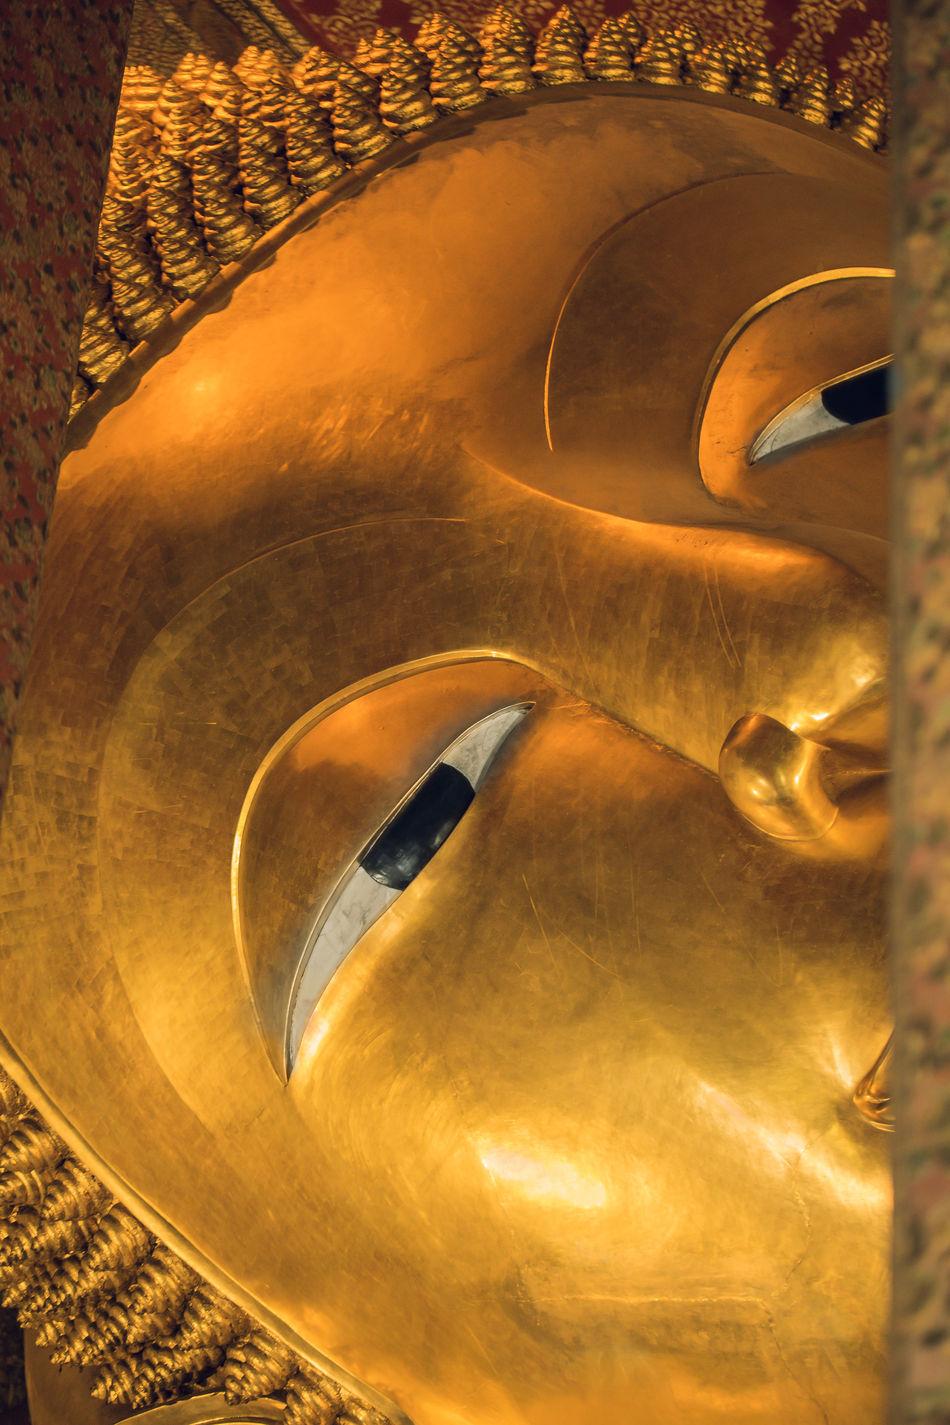 Close up on Buddha face Art Bangkok Buddha Buddhism Buddhist Buddhist Temple Close-up Culture Cultures Day Focus Gold Colored Indoors  No People Place Of Worship Power Relegion Relegious Religion Spirit Spiritual Spirituality Spritual Statue Wat Pho